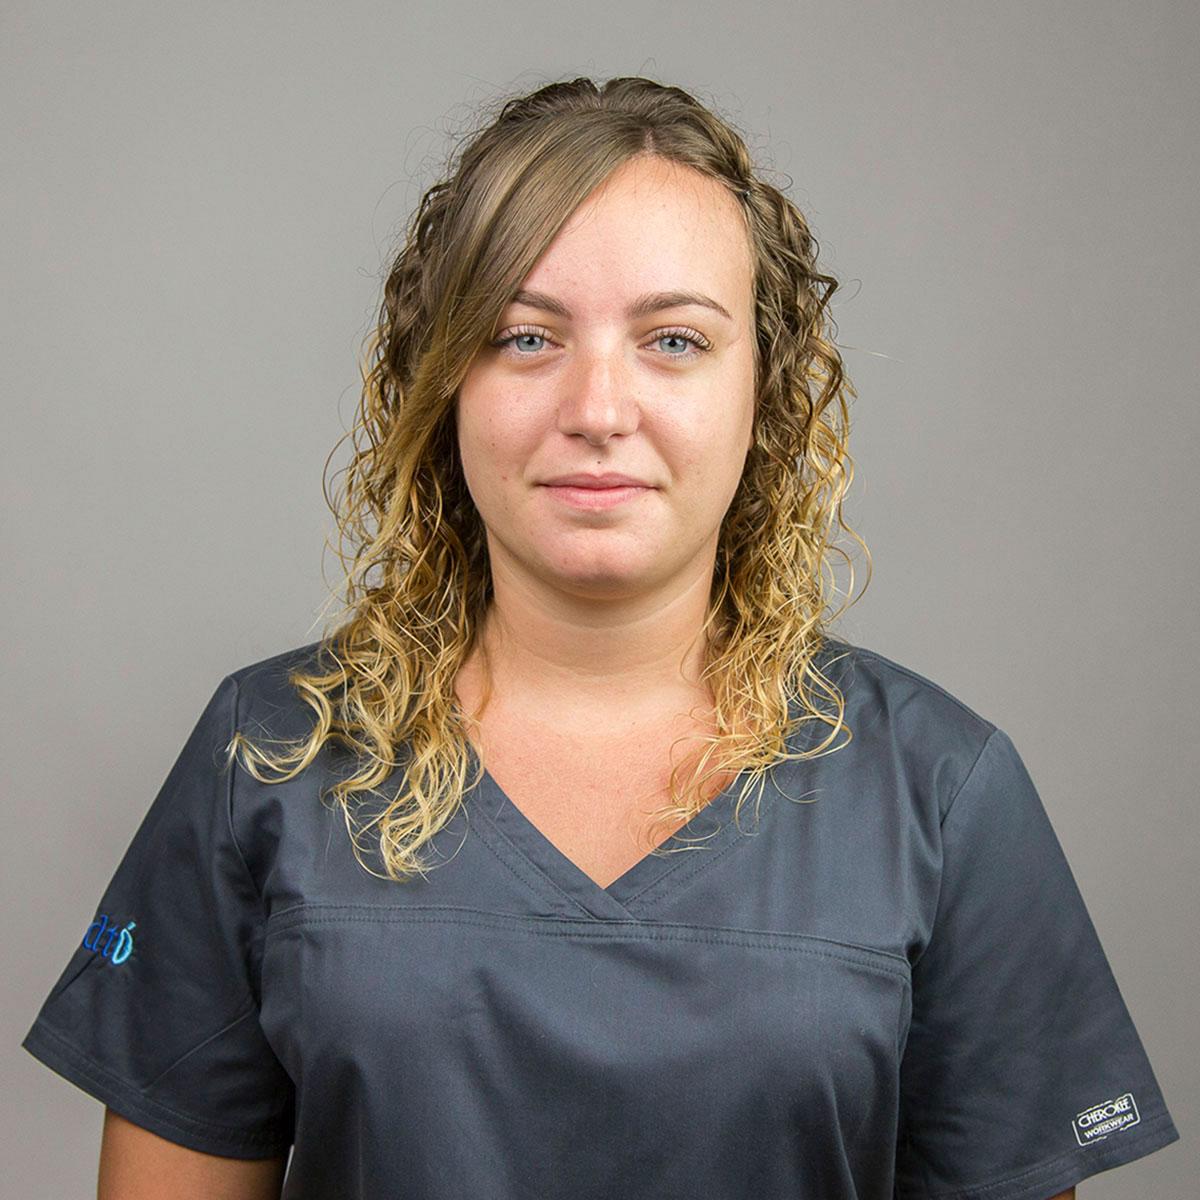 IVET RODRIGUEZ - Higienista dental - Auxiliar dental